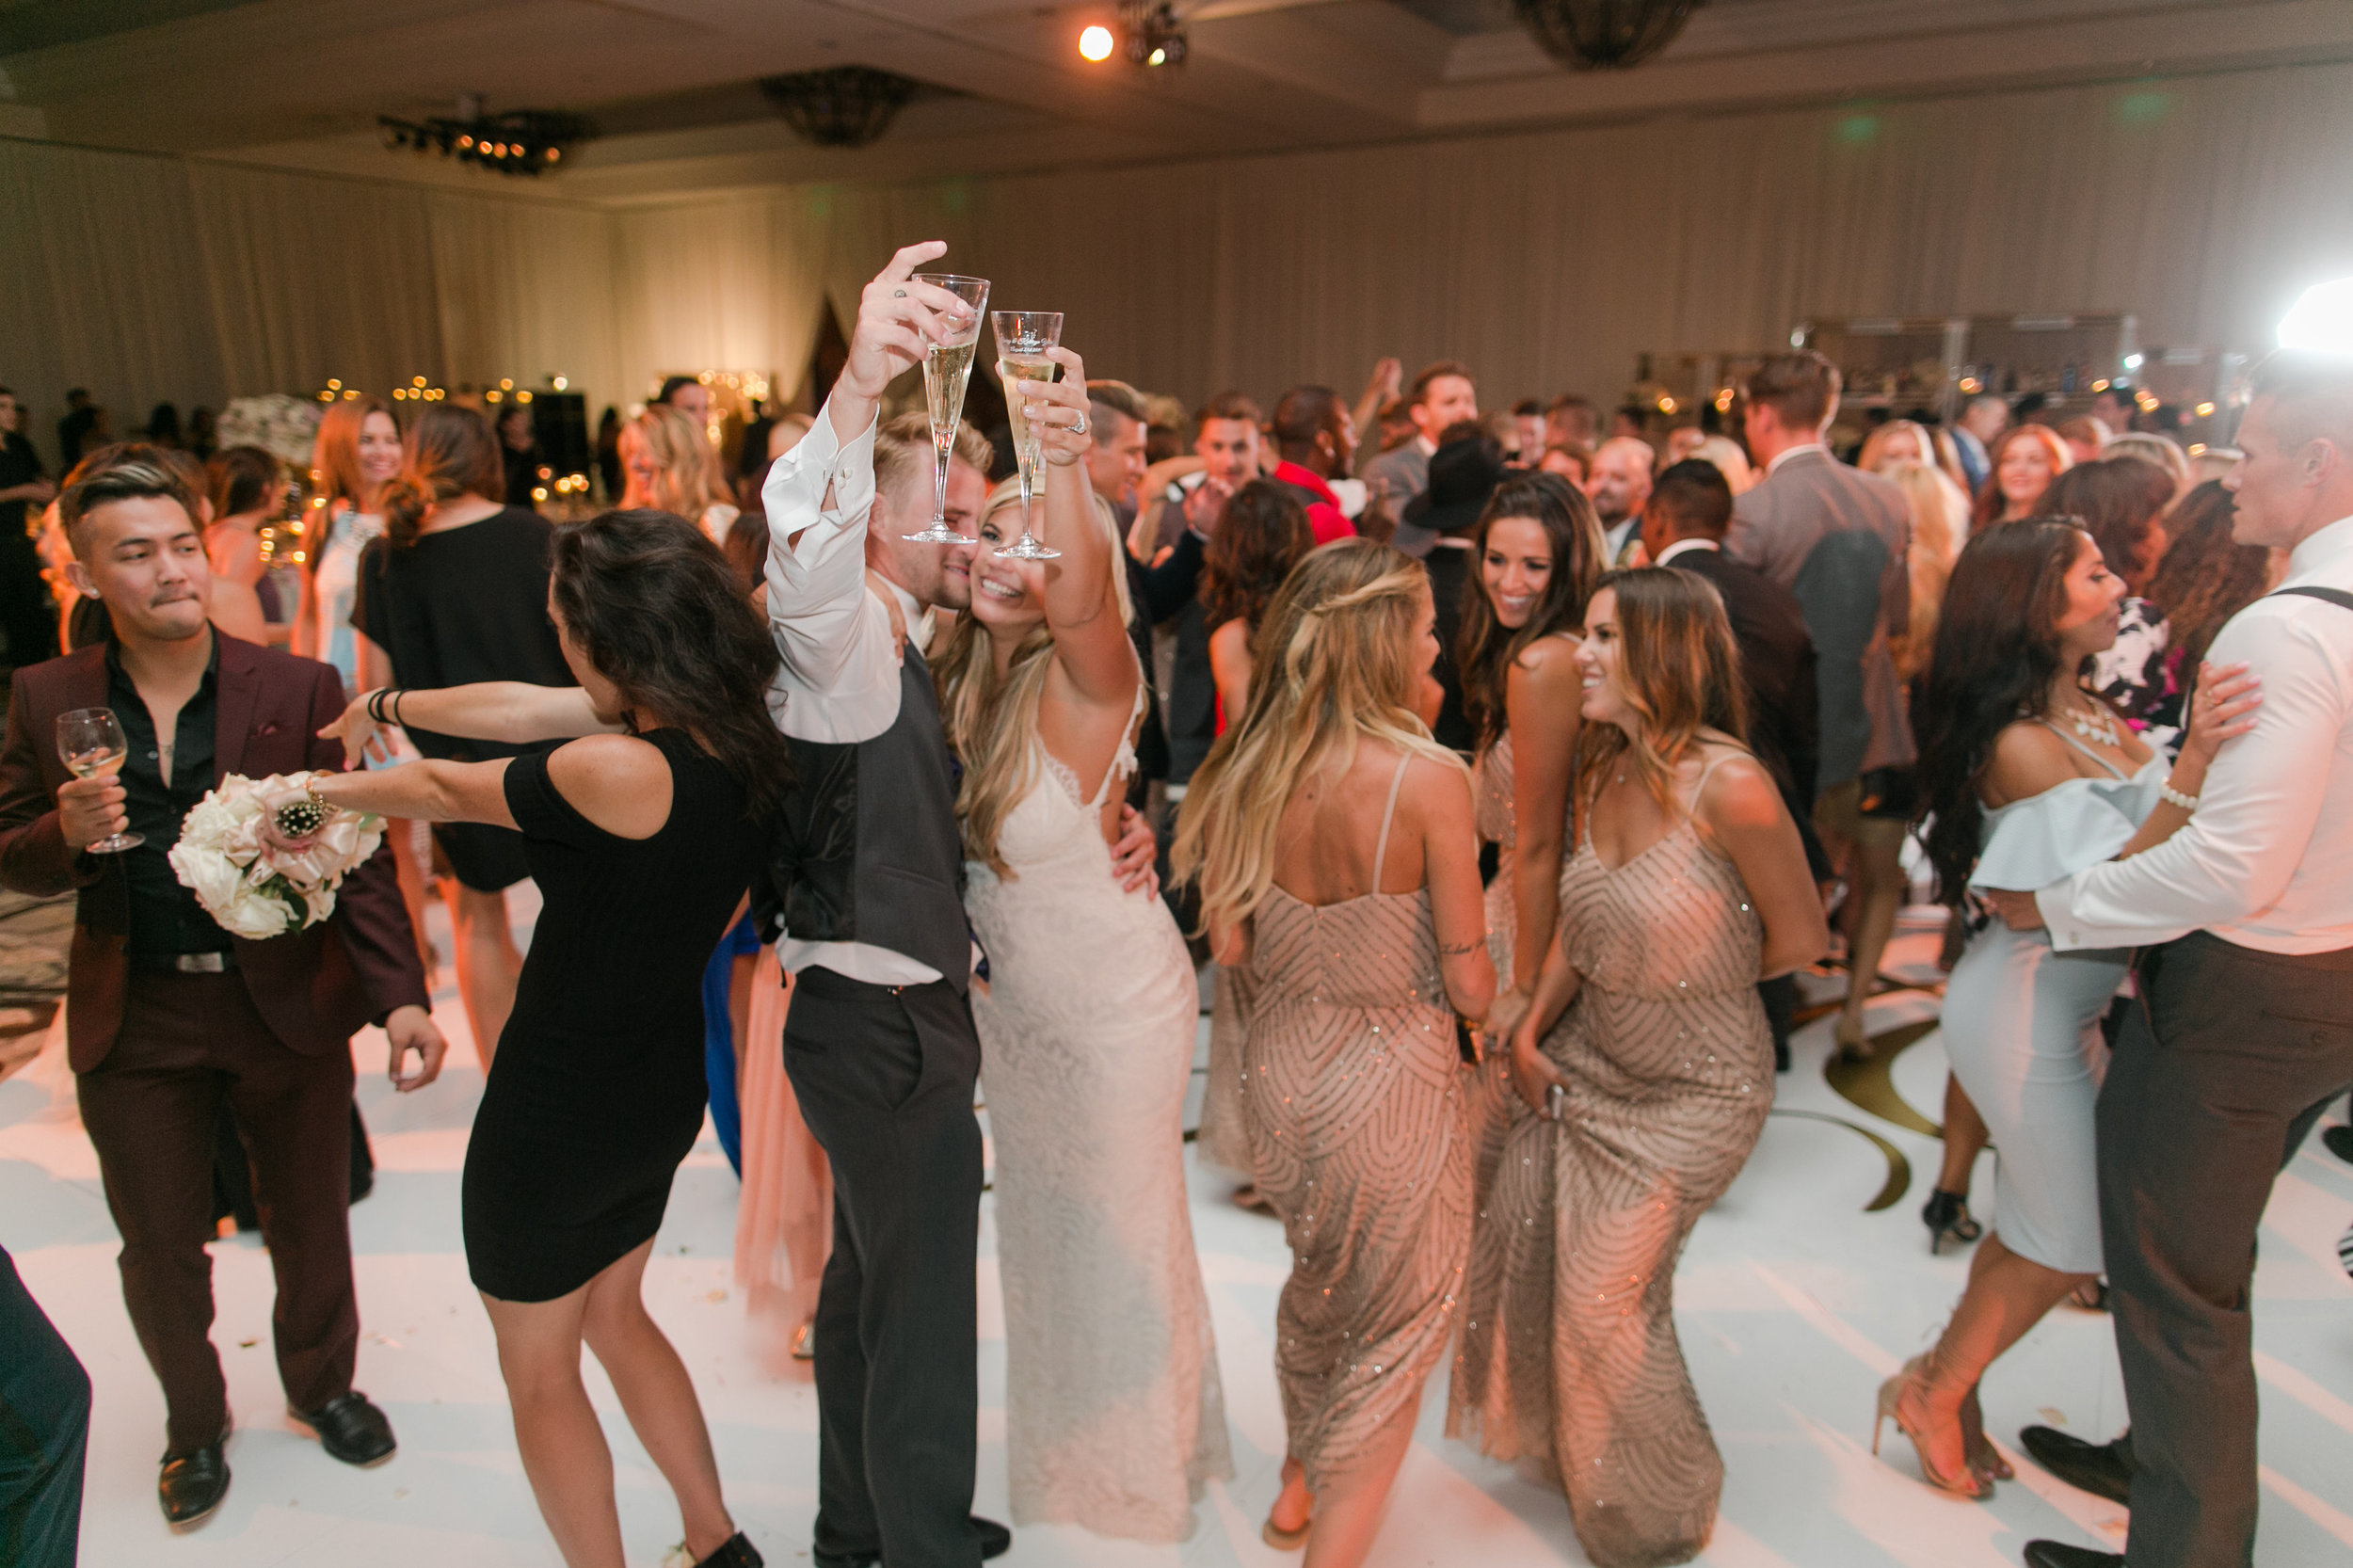 luxury-wedding-st-regis-21.jpg